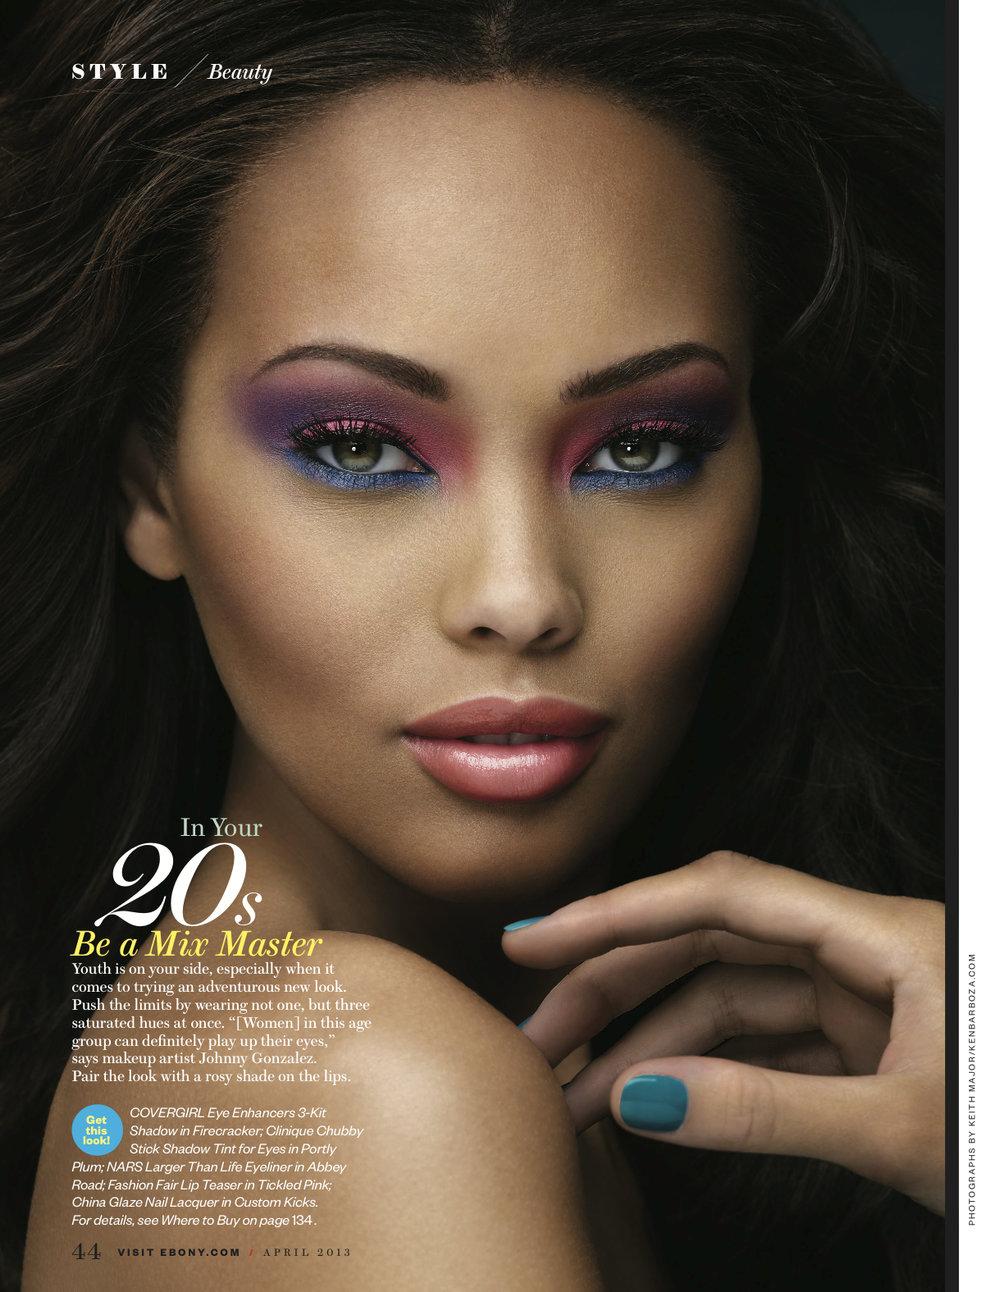 0413_Style_Age Beauty 1.jpg